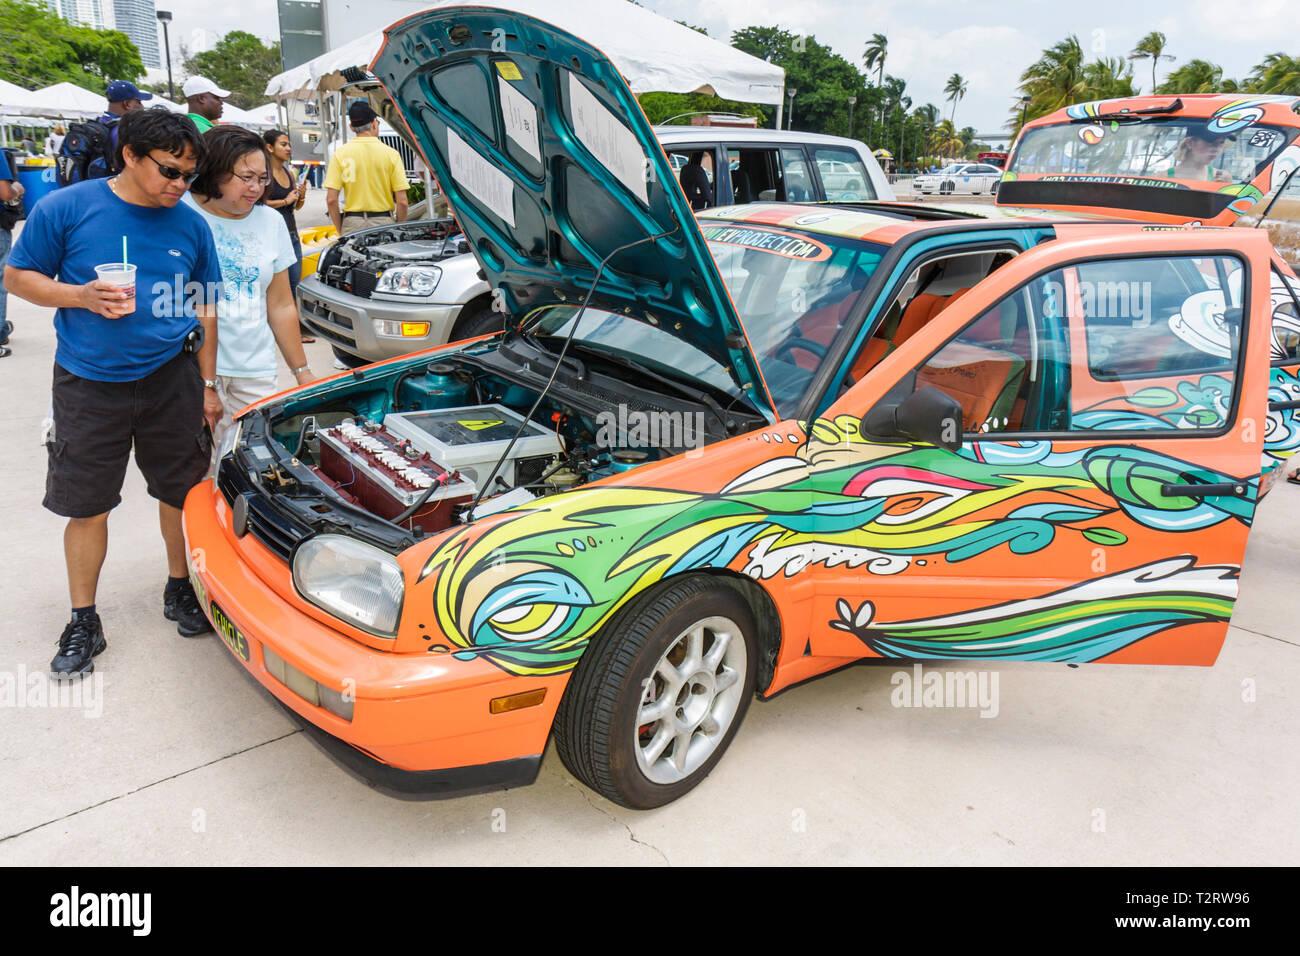 Miami Florida Bayfront Park Miami Goin' Green eco-friendly environment green event exhibitor EV Project electric vehicle car alt Stock Photo